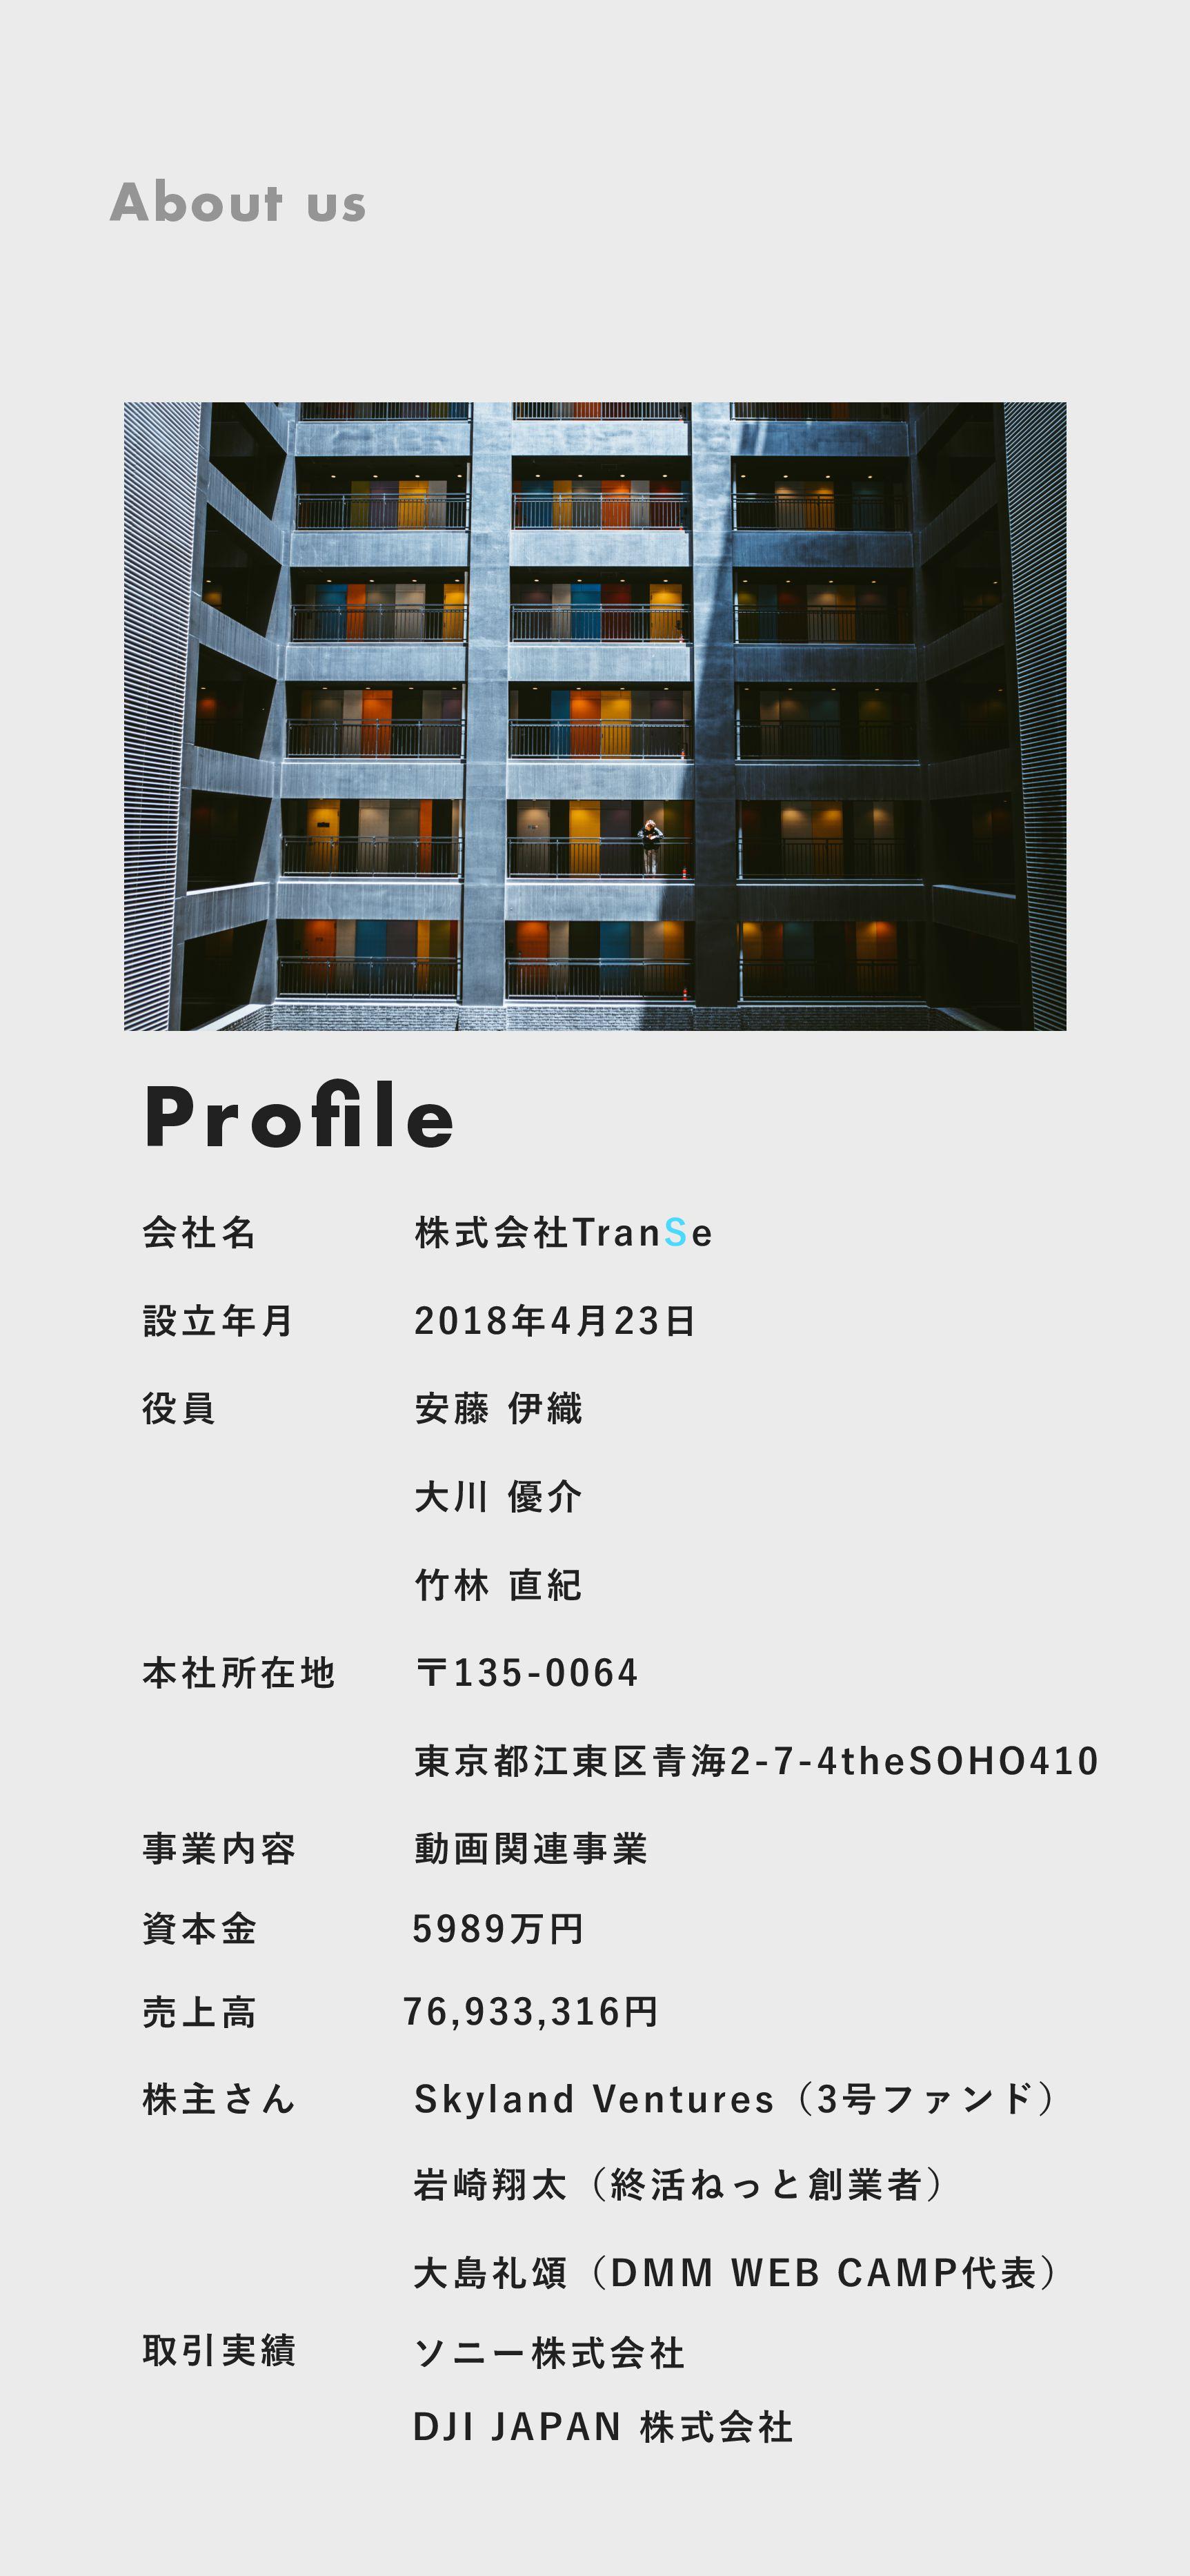 Profile ձ໊ࣾ һ ઃཱ݄ ຊࣾॴࡏ ۀ༰ גओ͞Μ גࣜձࣾ5SBO4F ҆...